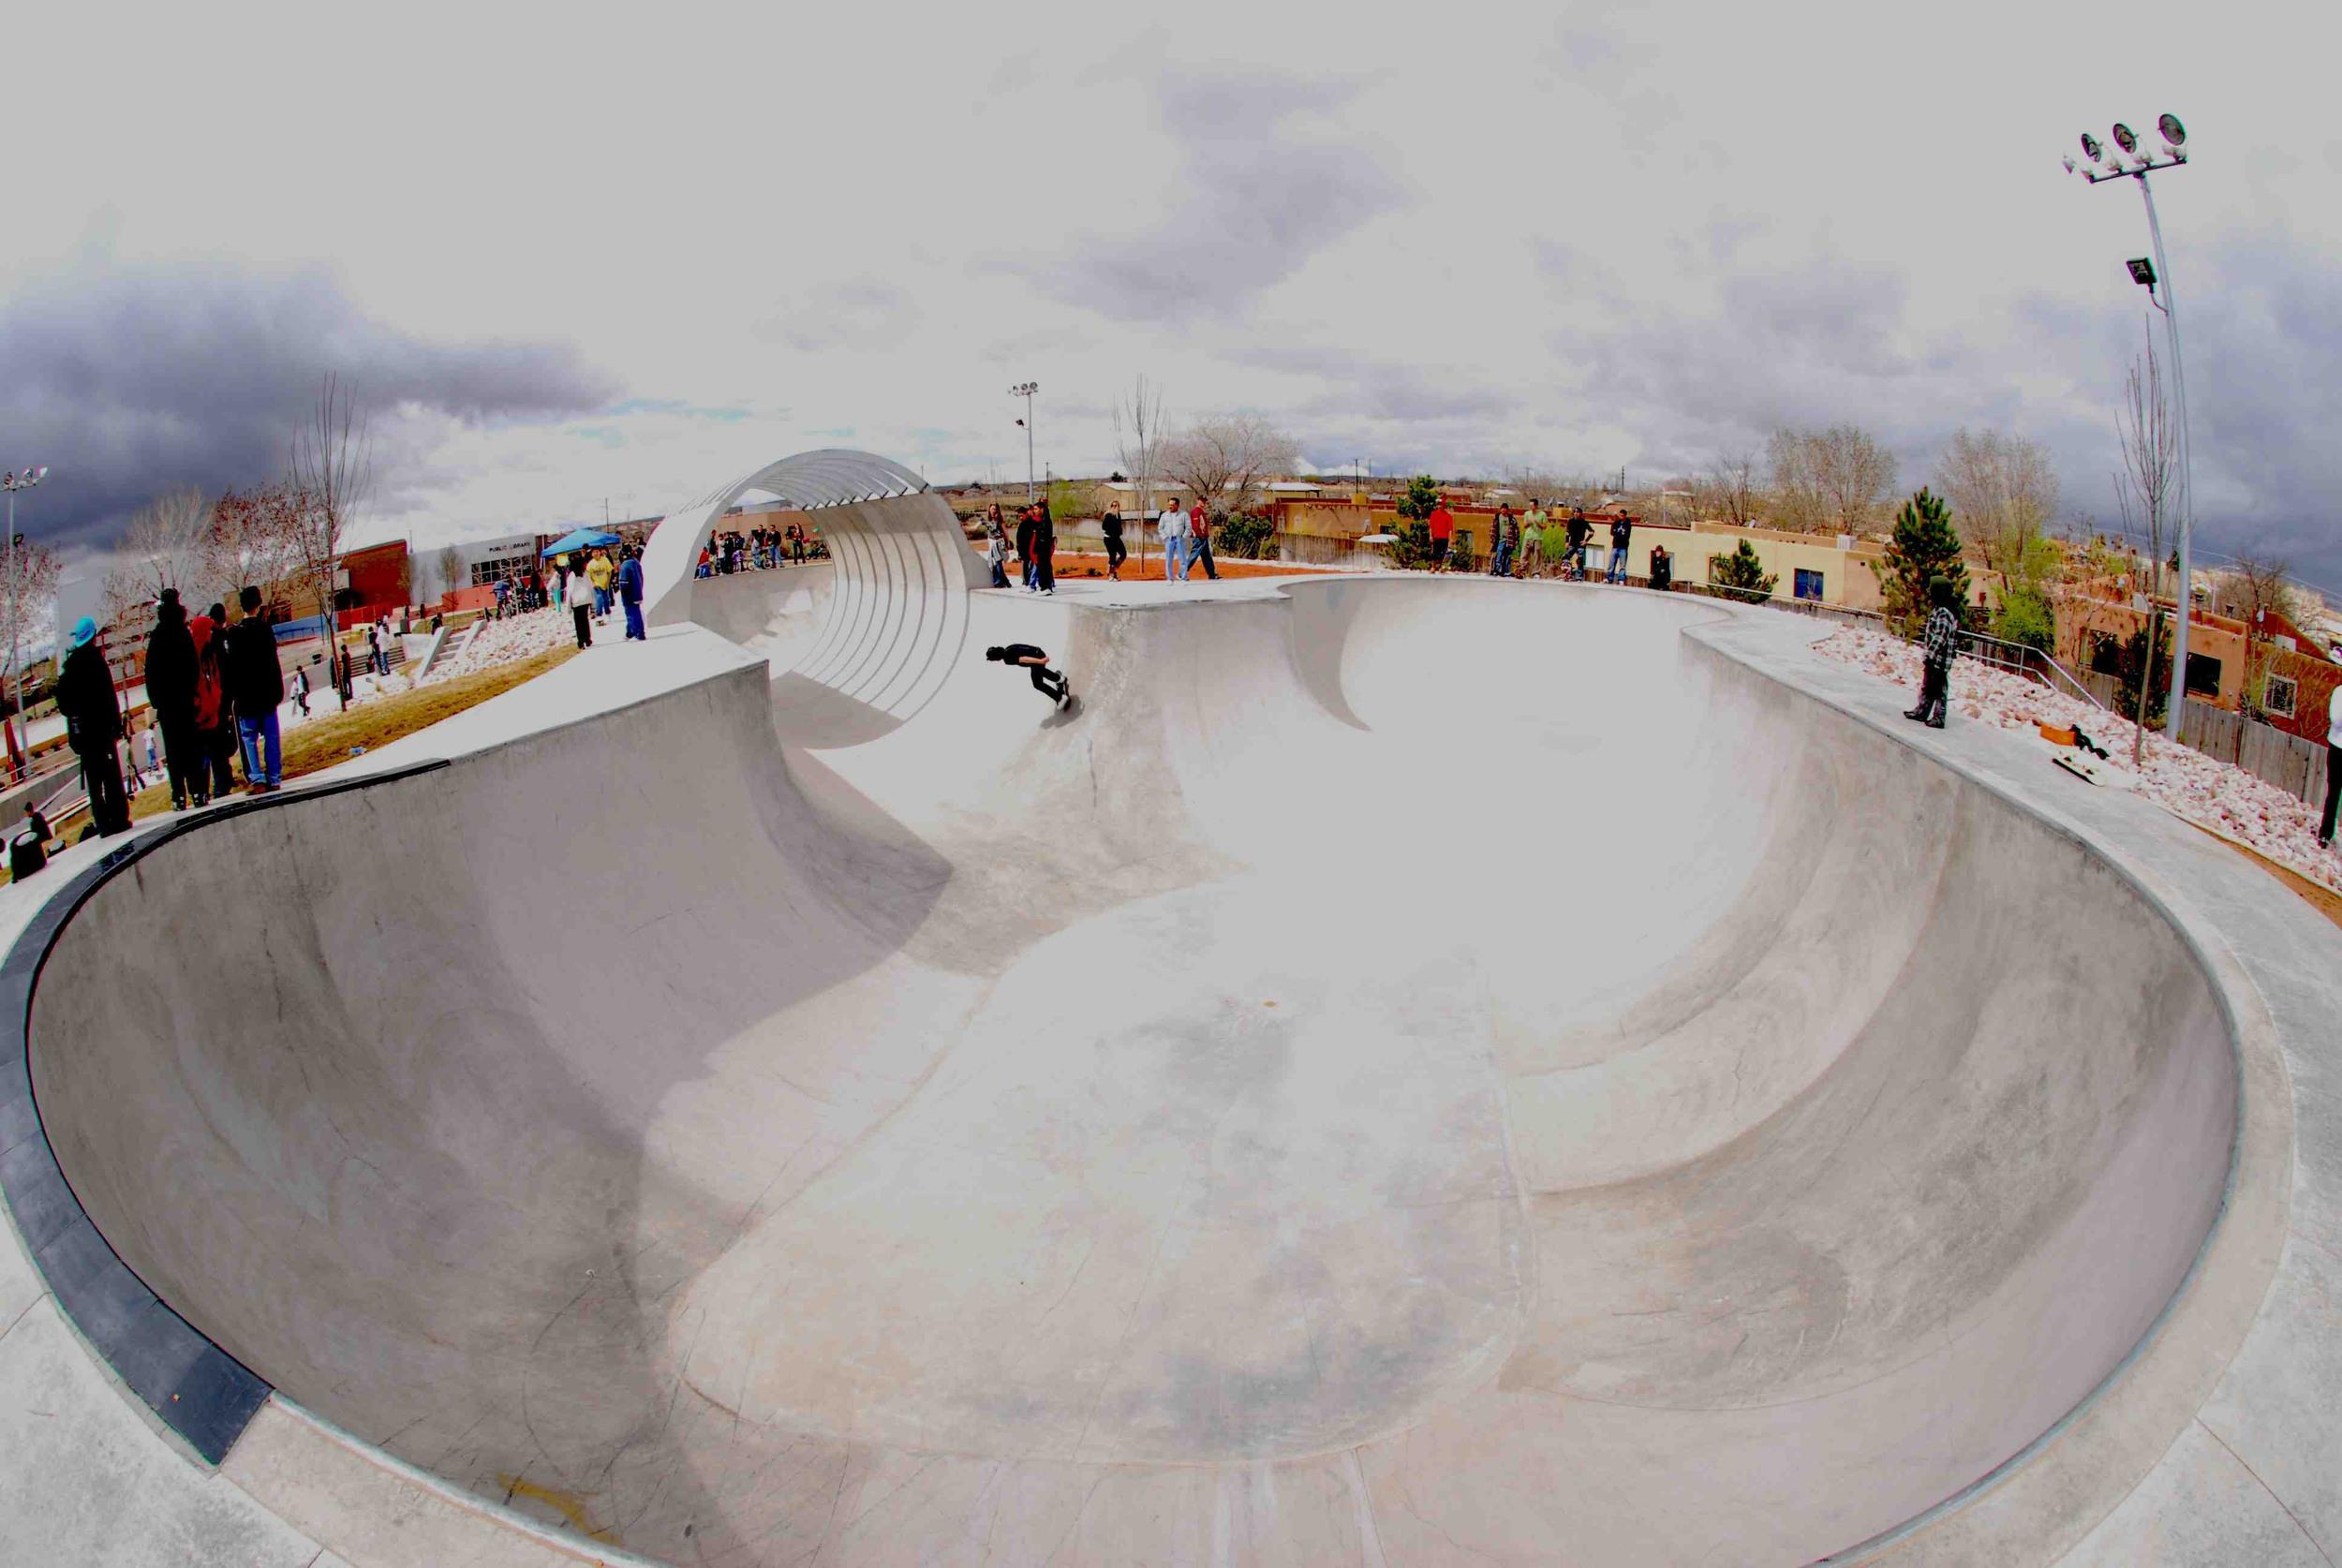 The Bowl at Alamosa Skate Park, Albuquerque NM